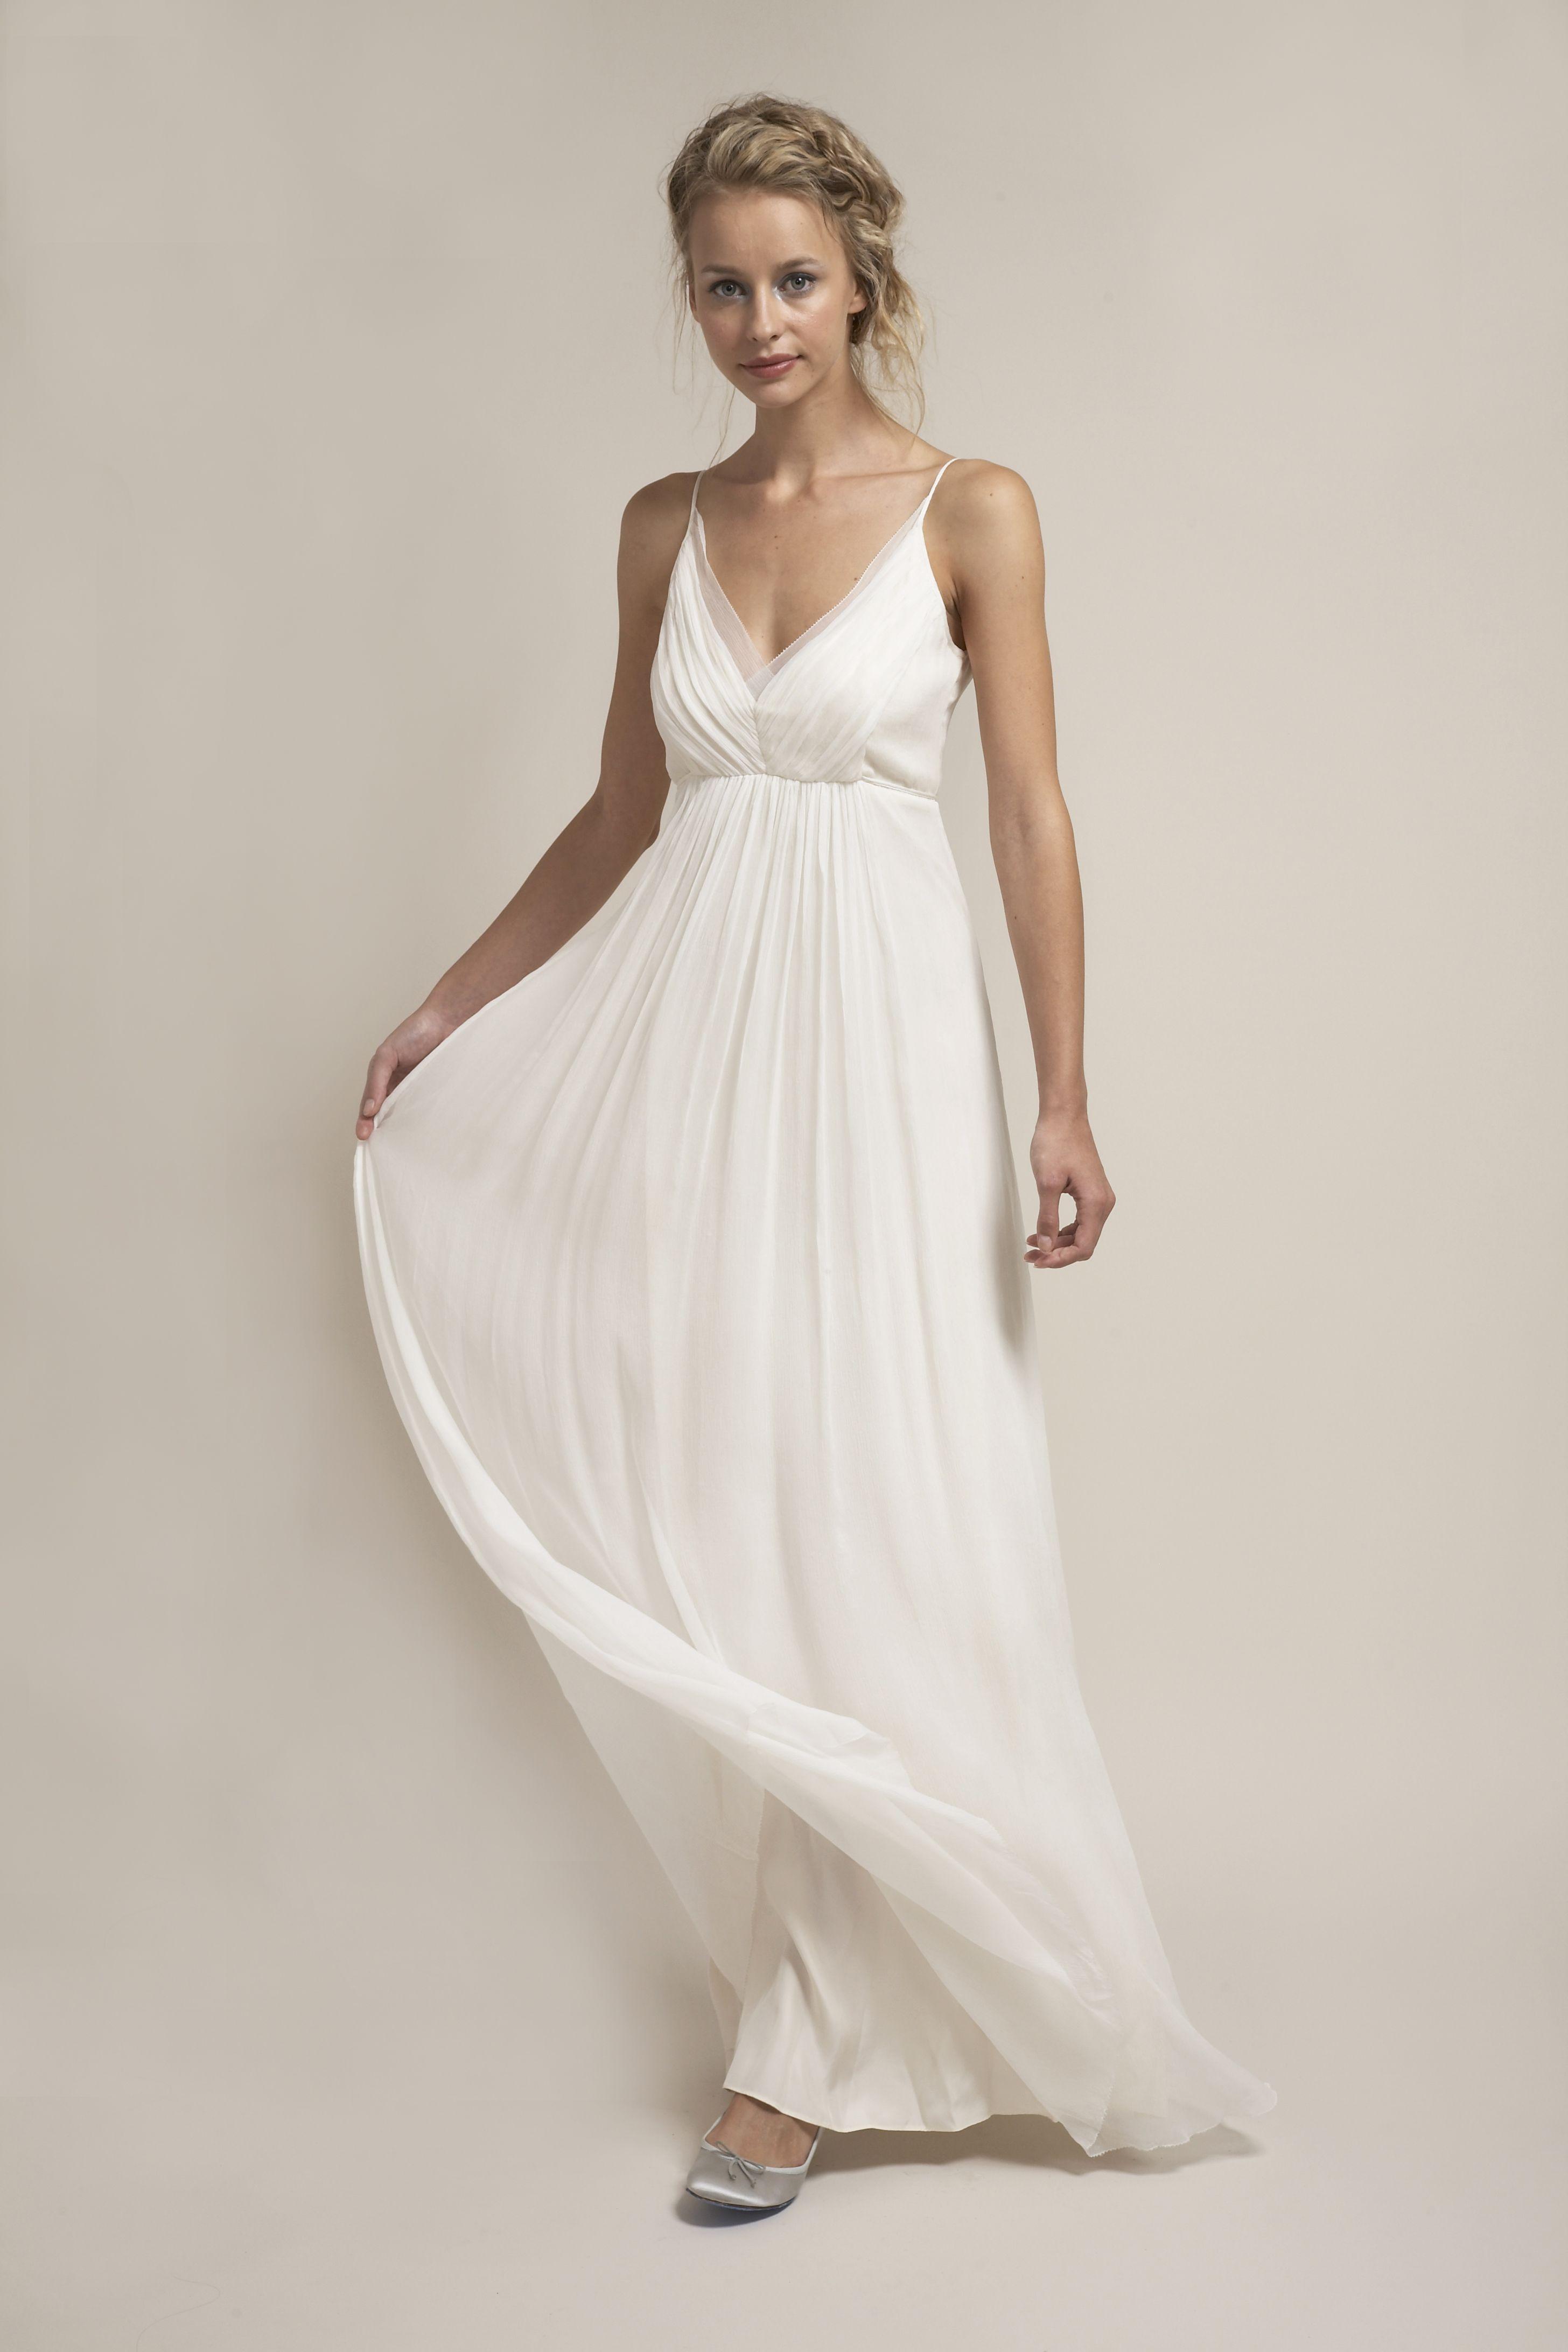 Hb effortless and simply stunning wedding dress wedding ideas